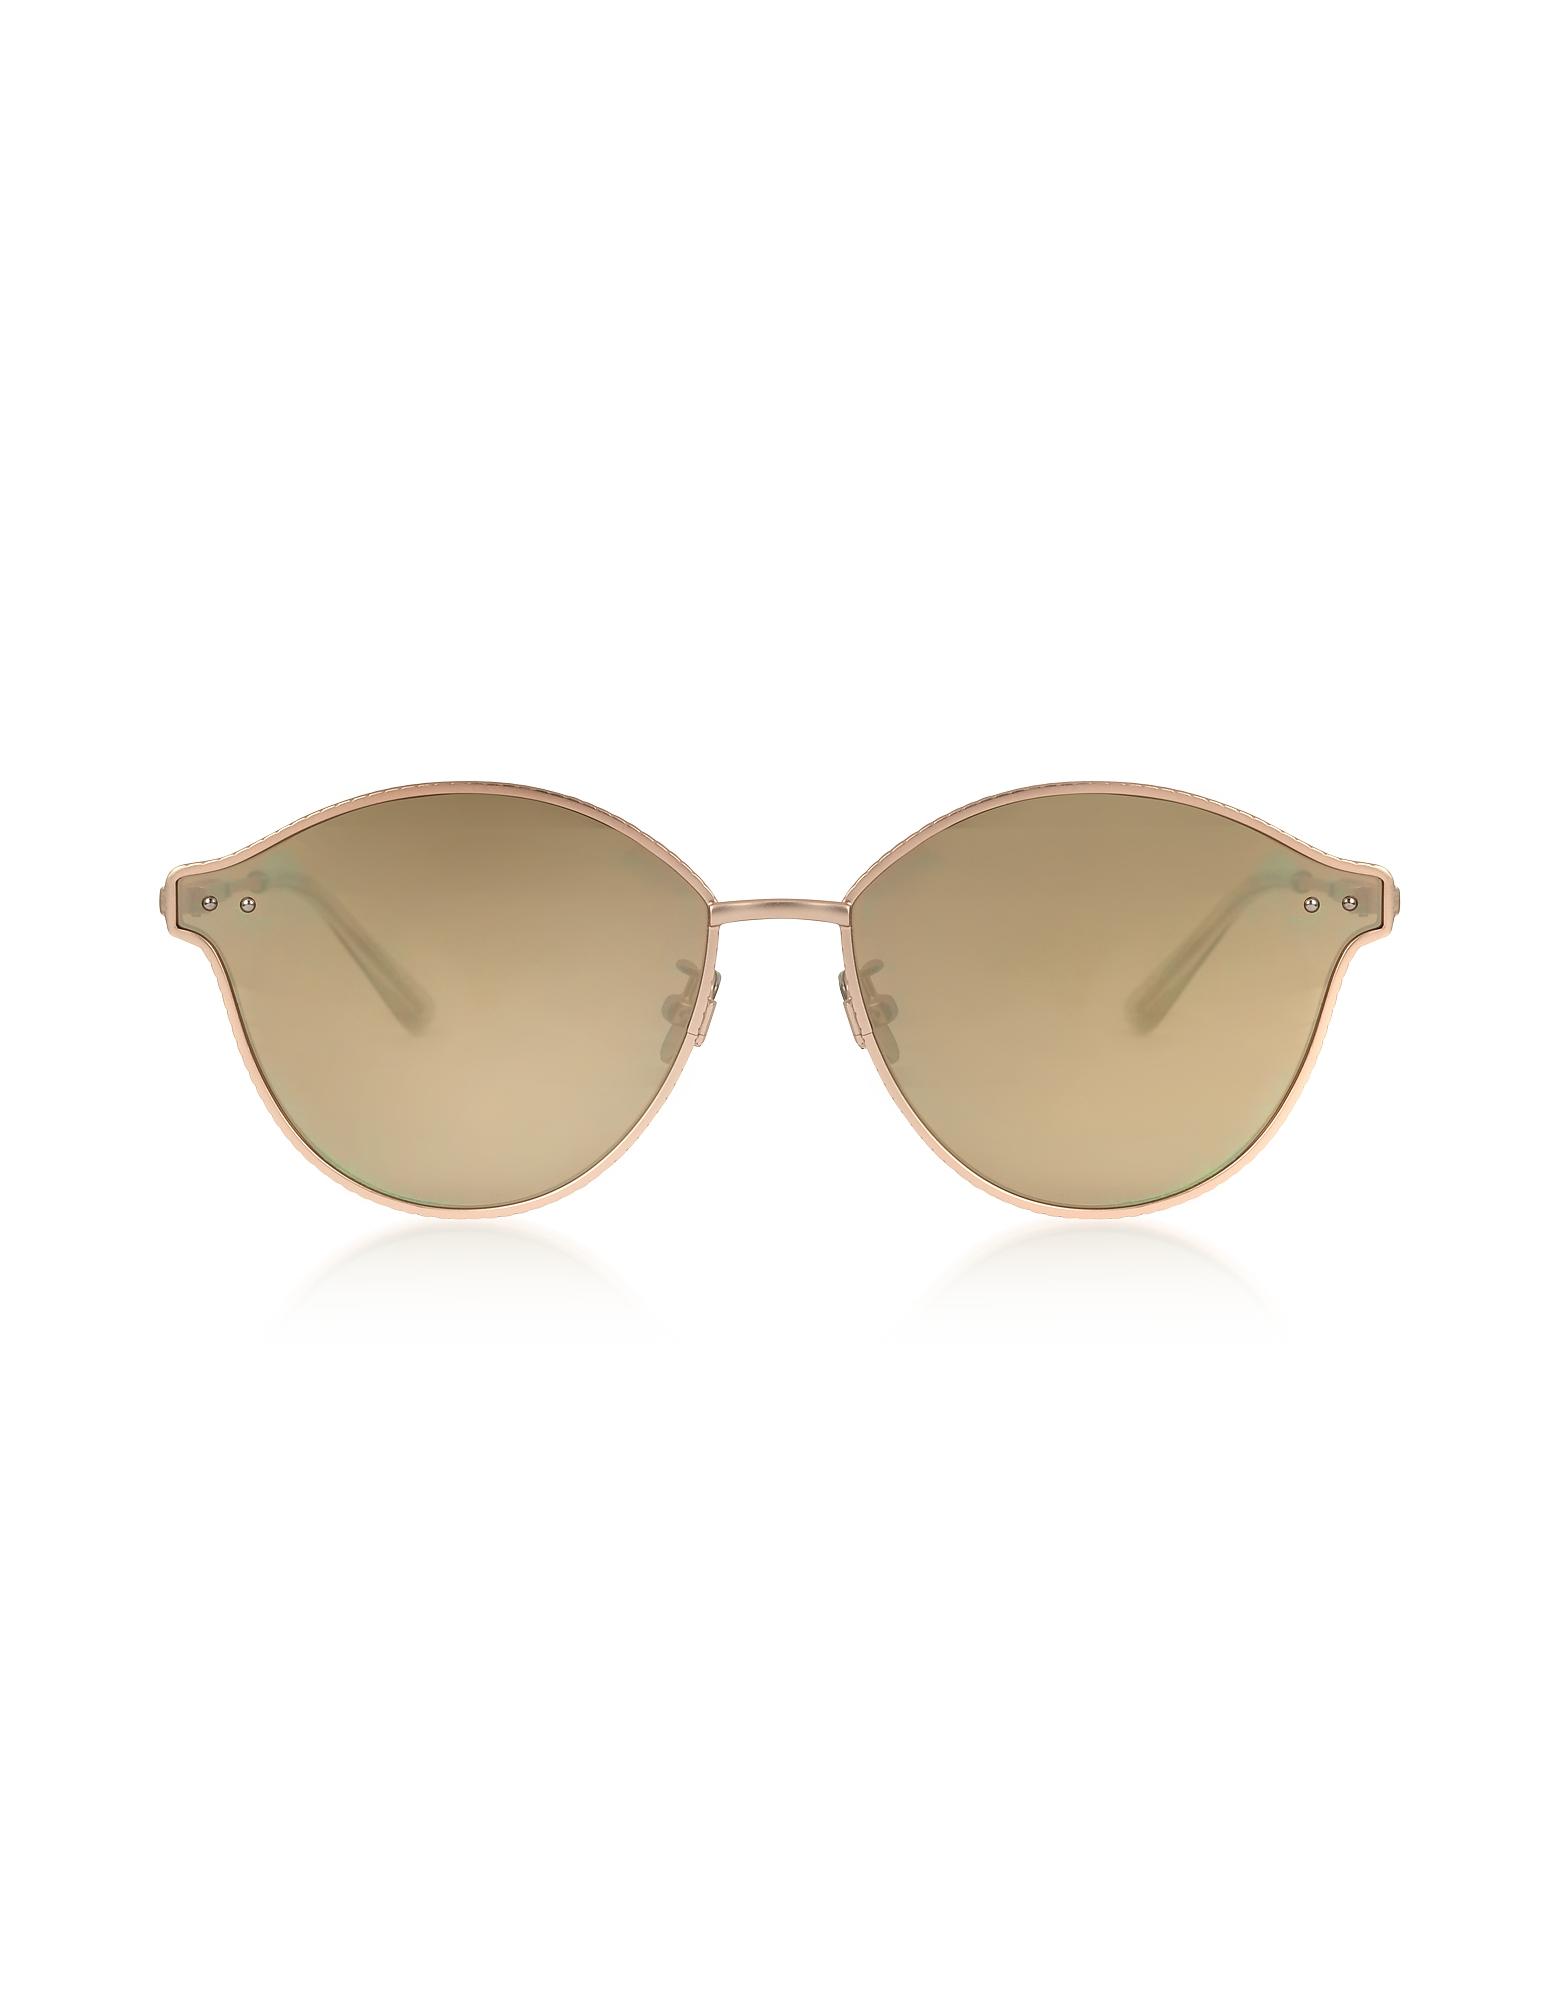 Bottega Veneta Designer Sunglasses, BV0139S 004 Golden Metal Unisex Sunglasses